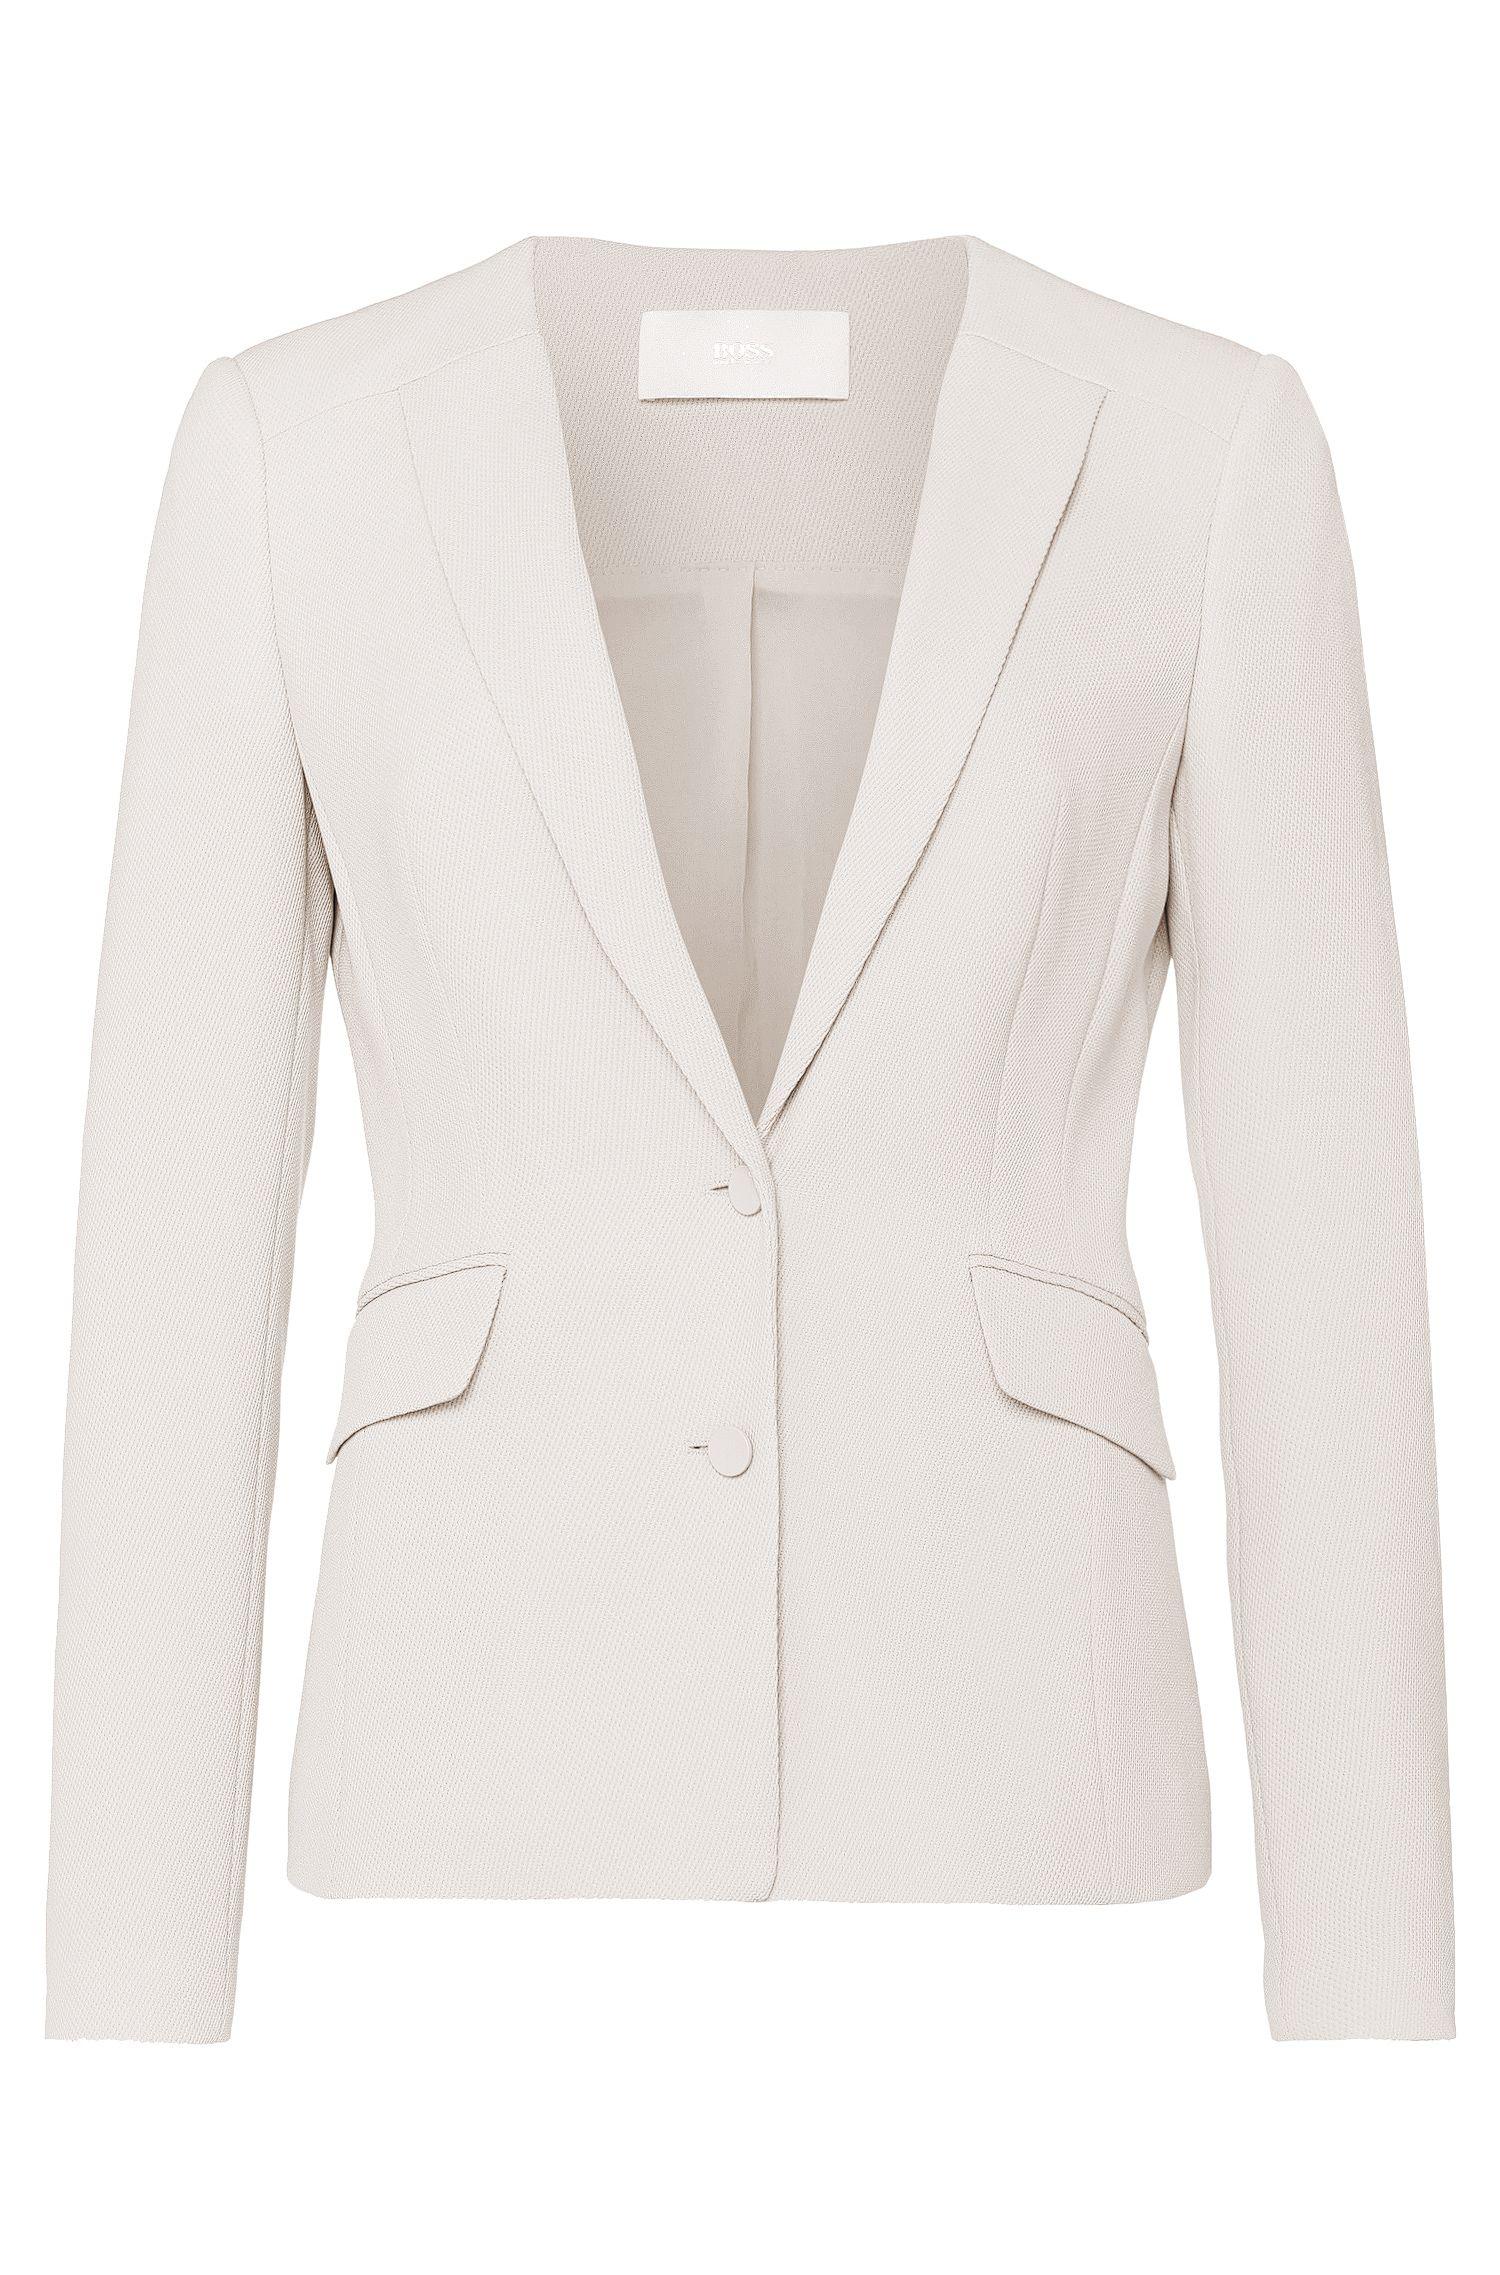 'Jamarine ' | Textured Traictetate Blend Suit Jacket